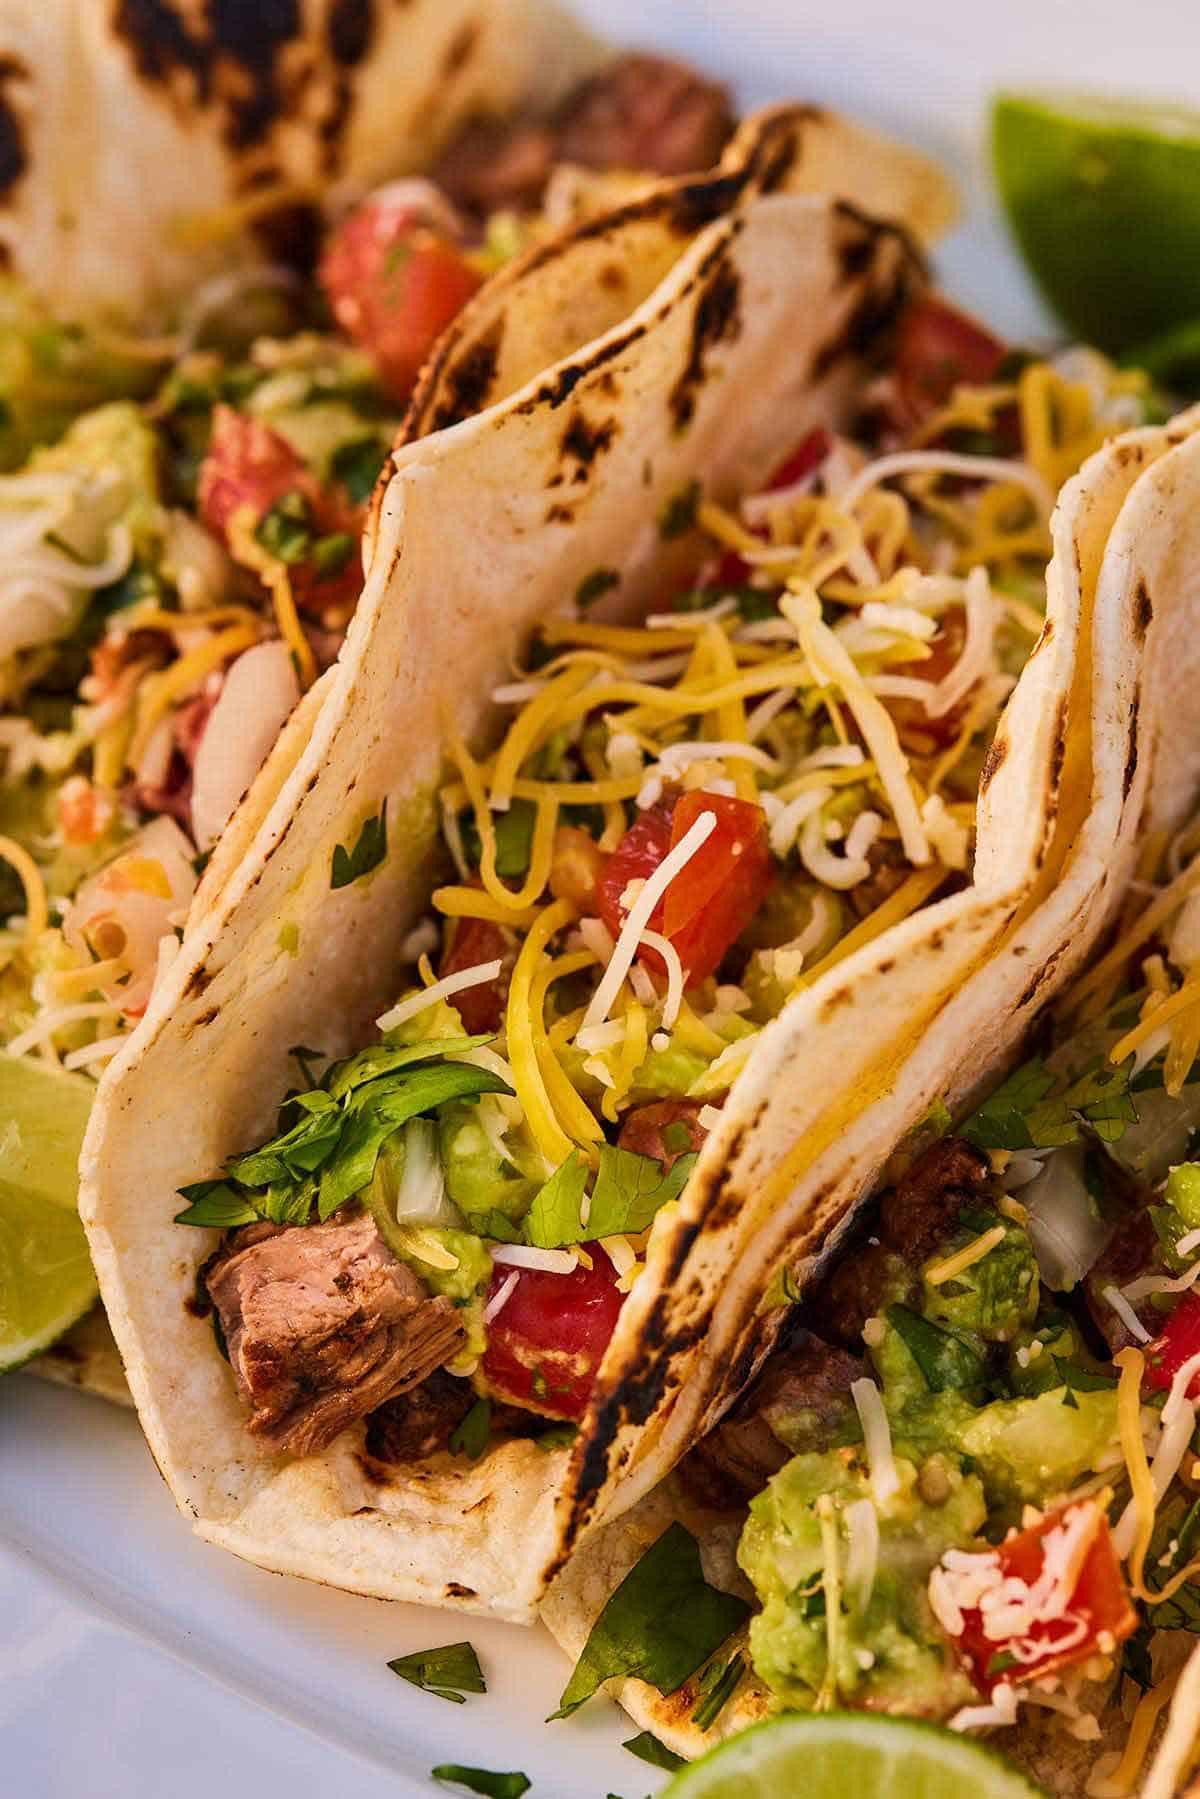 Close up a carne asada taco with shredded cheese, pico de gallo, and guacamole.